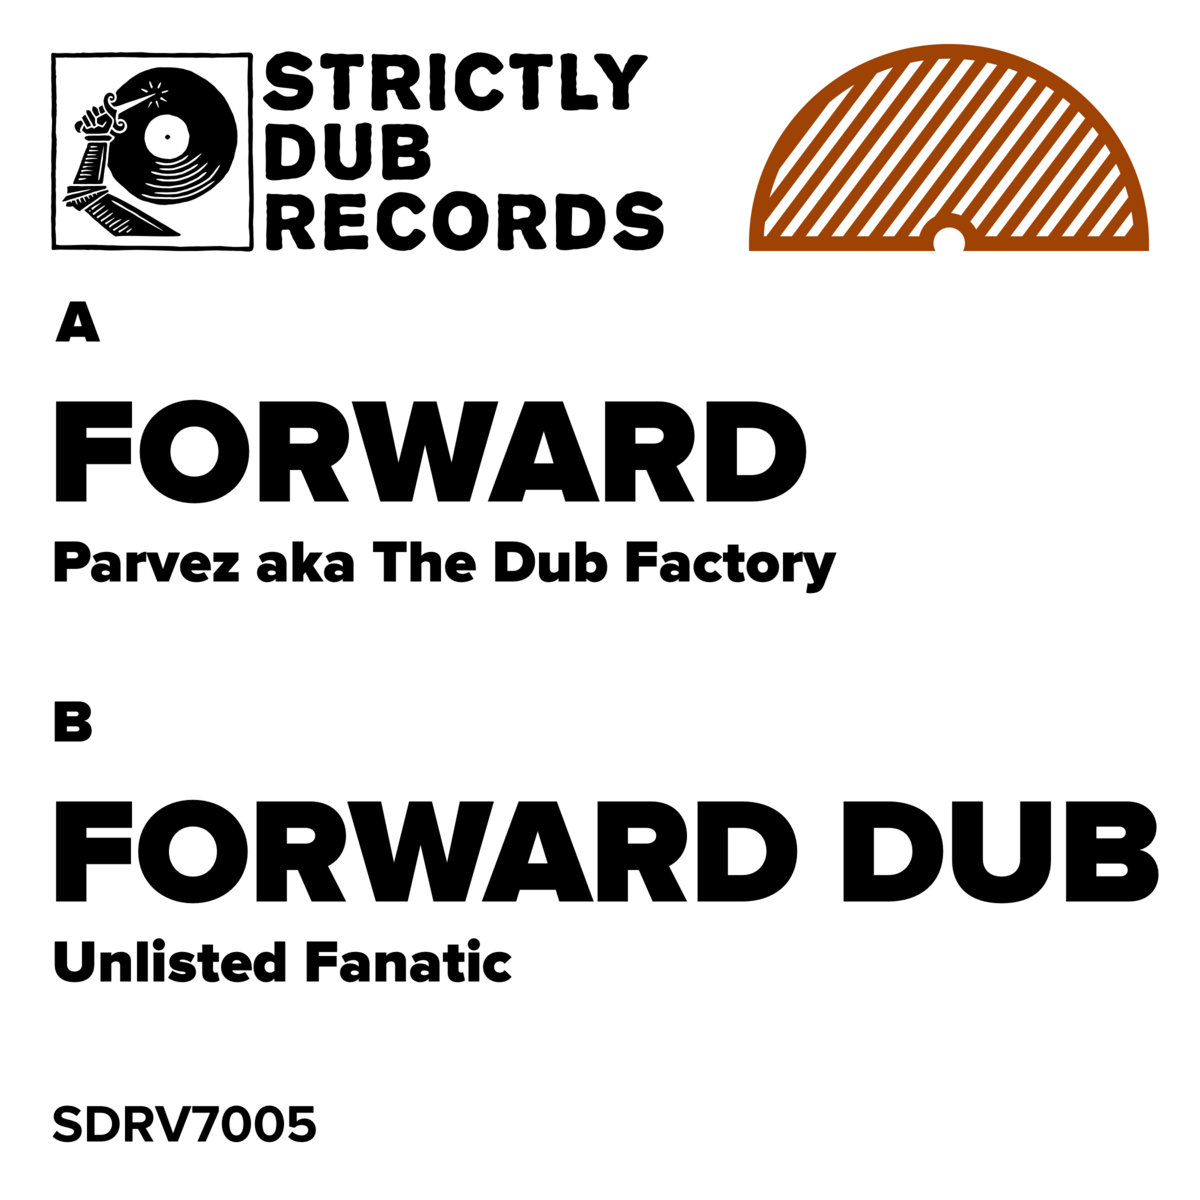 parvez aka the dub factory forward strictly dub records